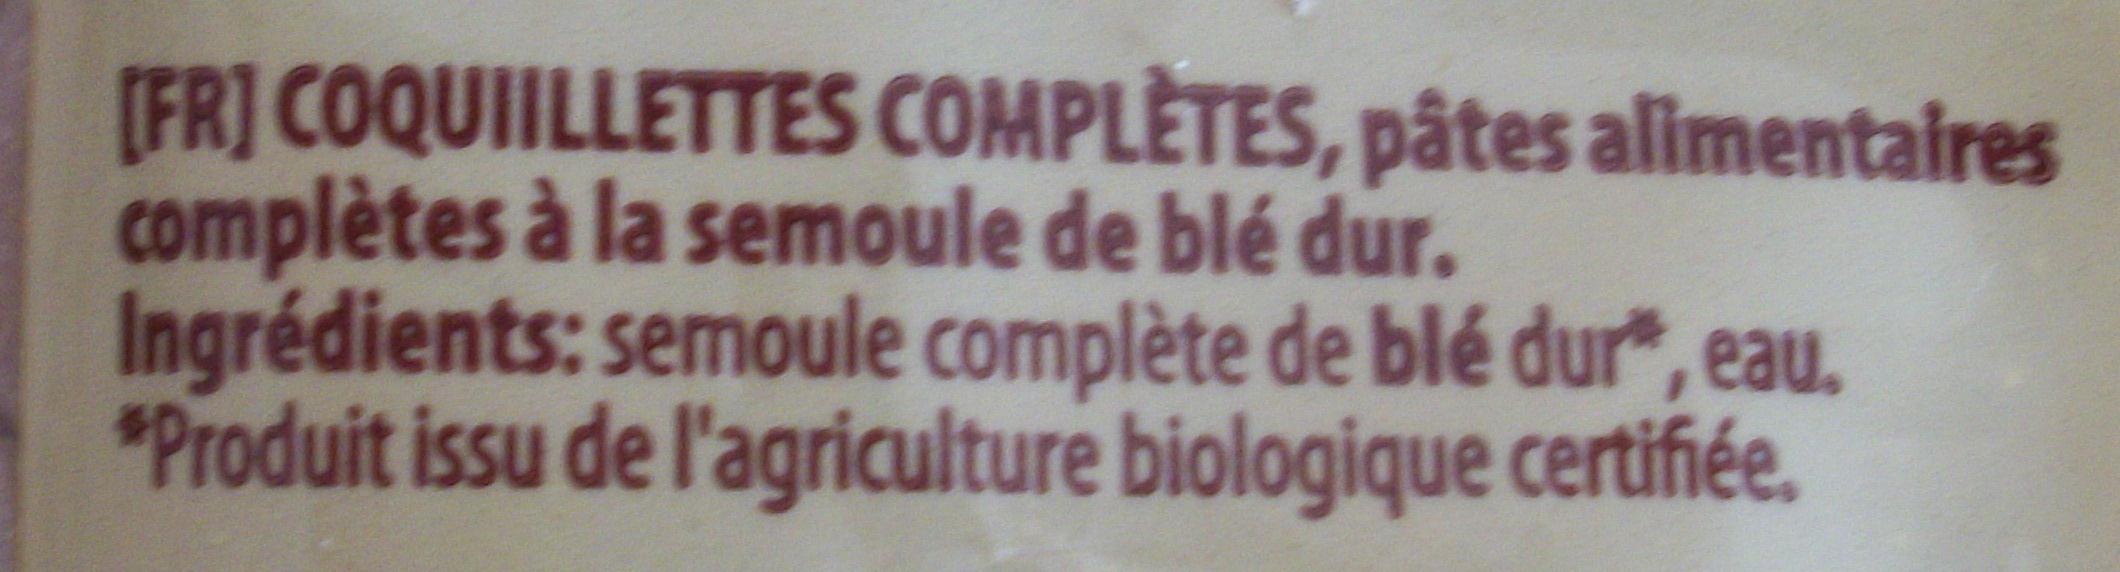 Coquillettes complètes Bio (Gomitini) - Ingrédients